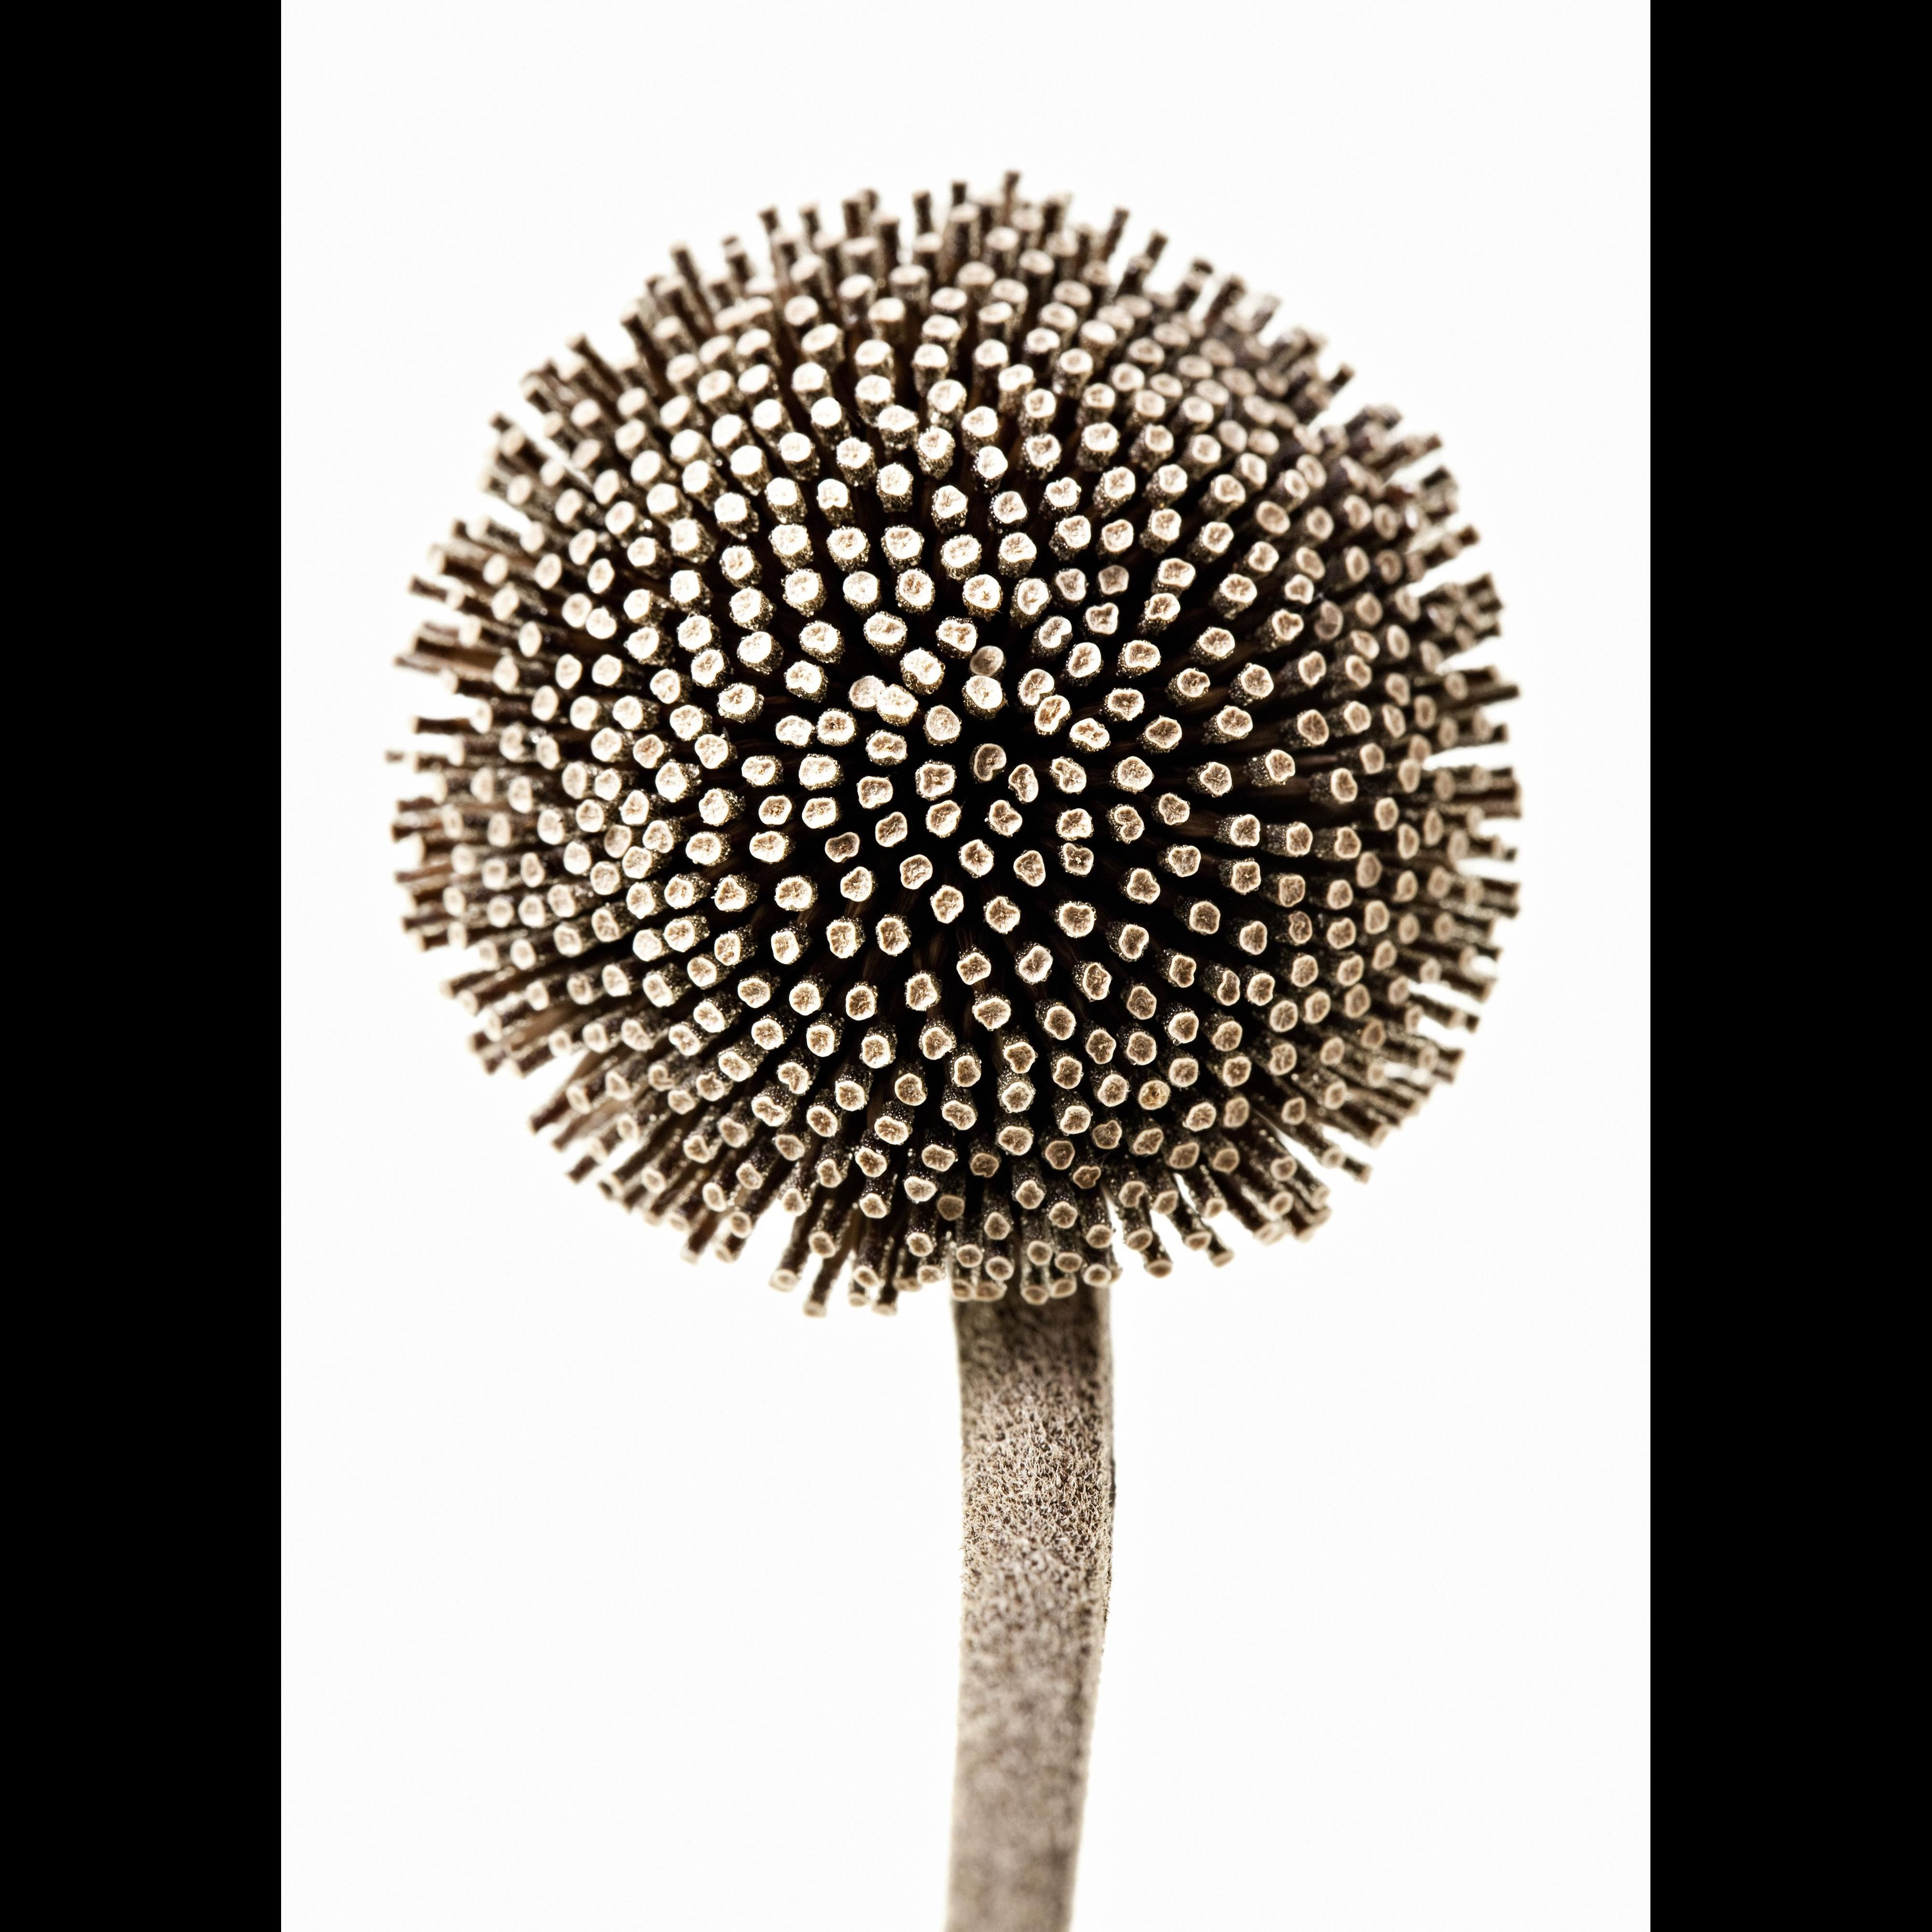 Flora supersum – Lena Granefelt